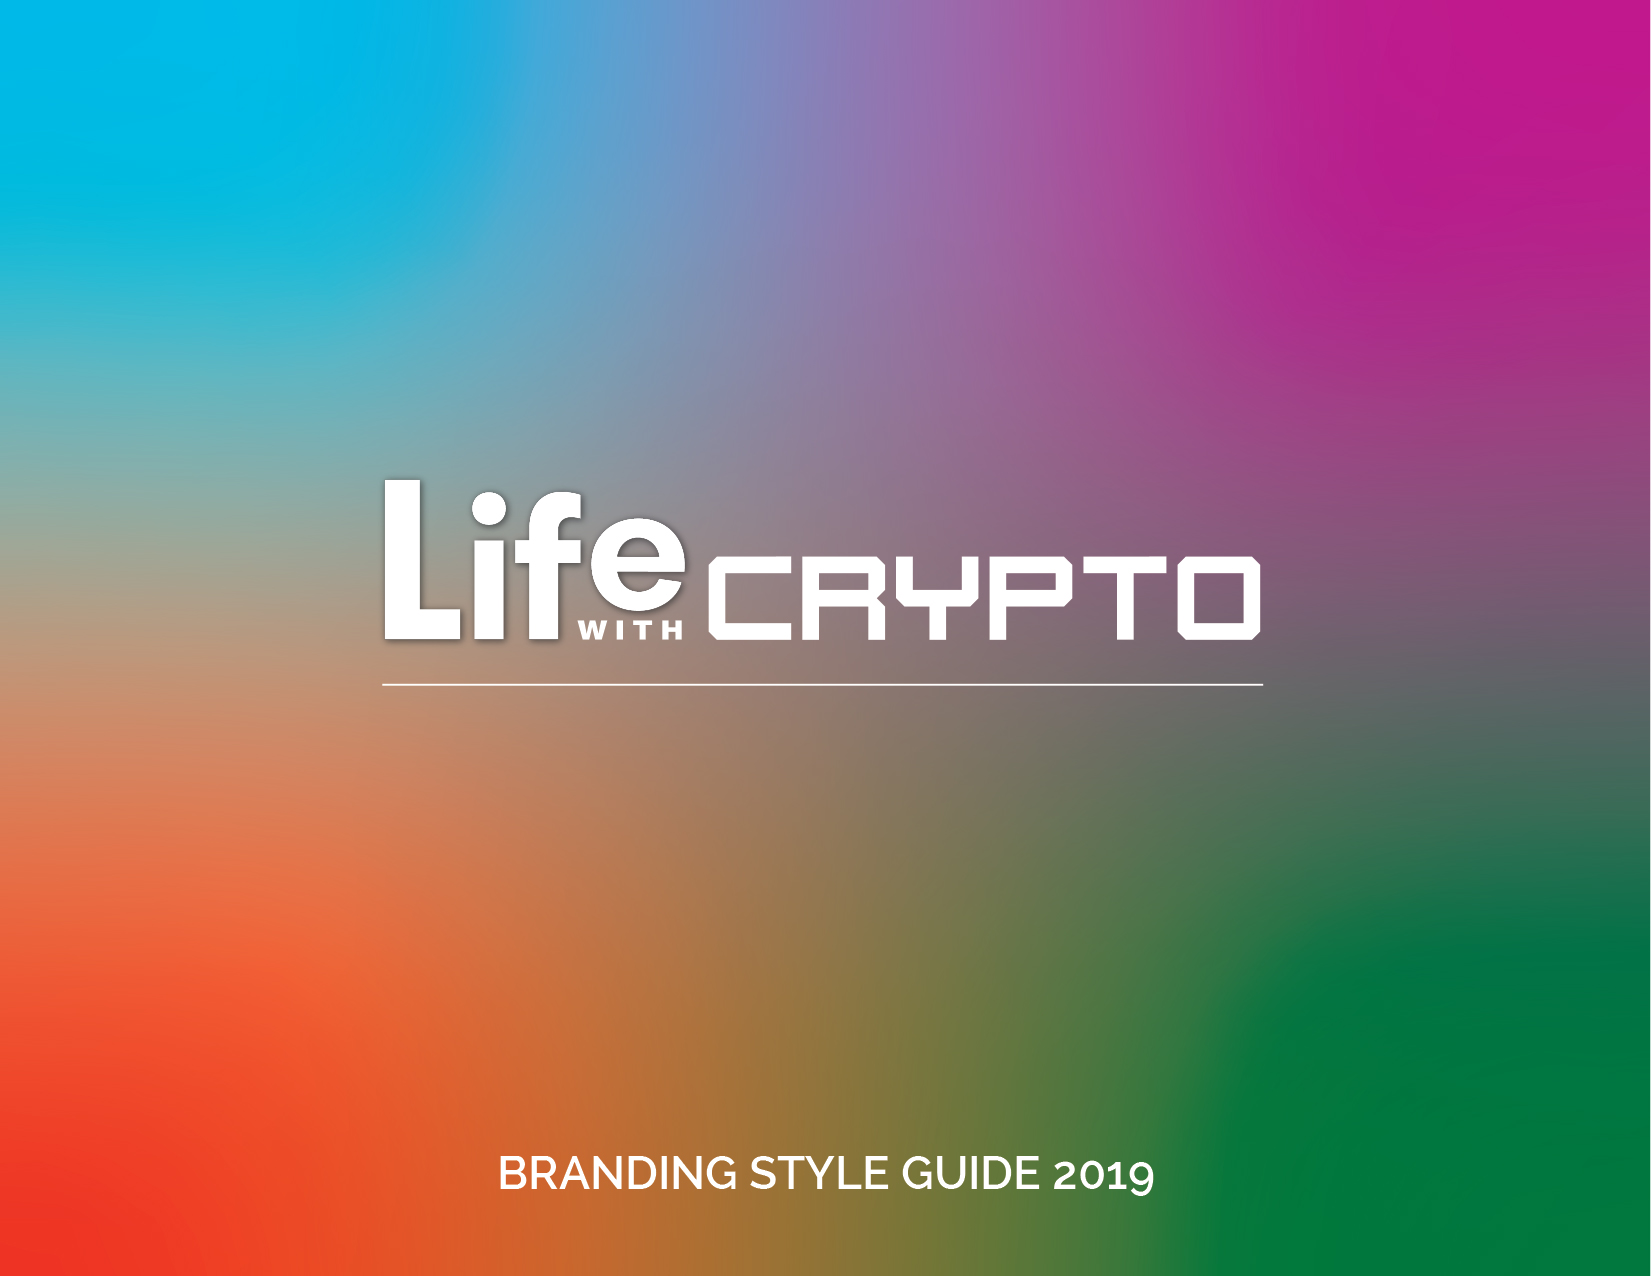 2018-LWC-Brand-Style-Guide--01.jpg